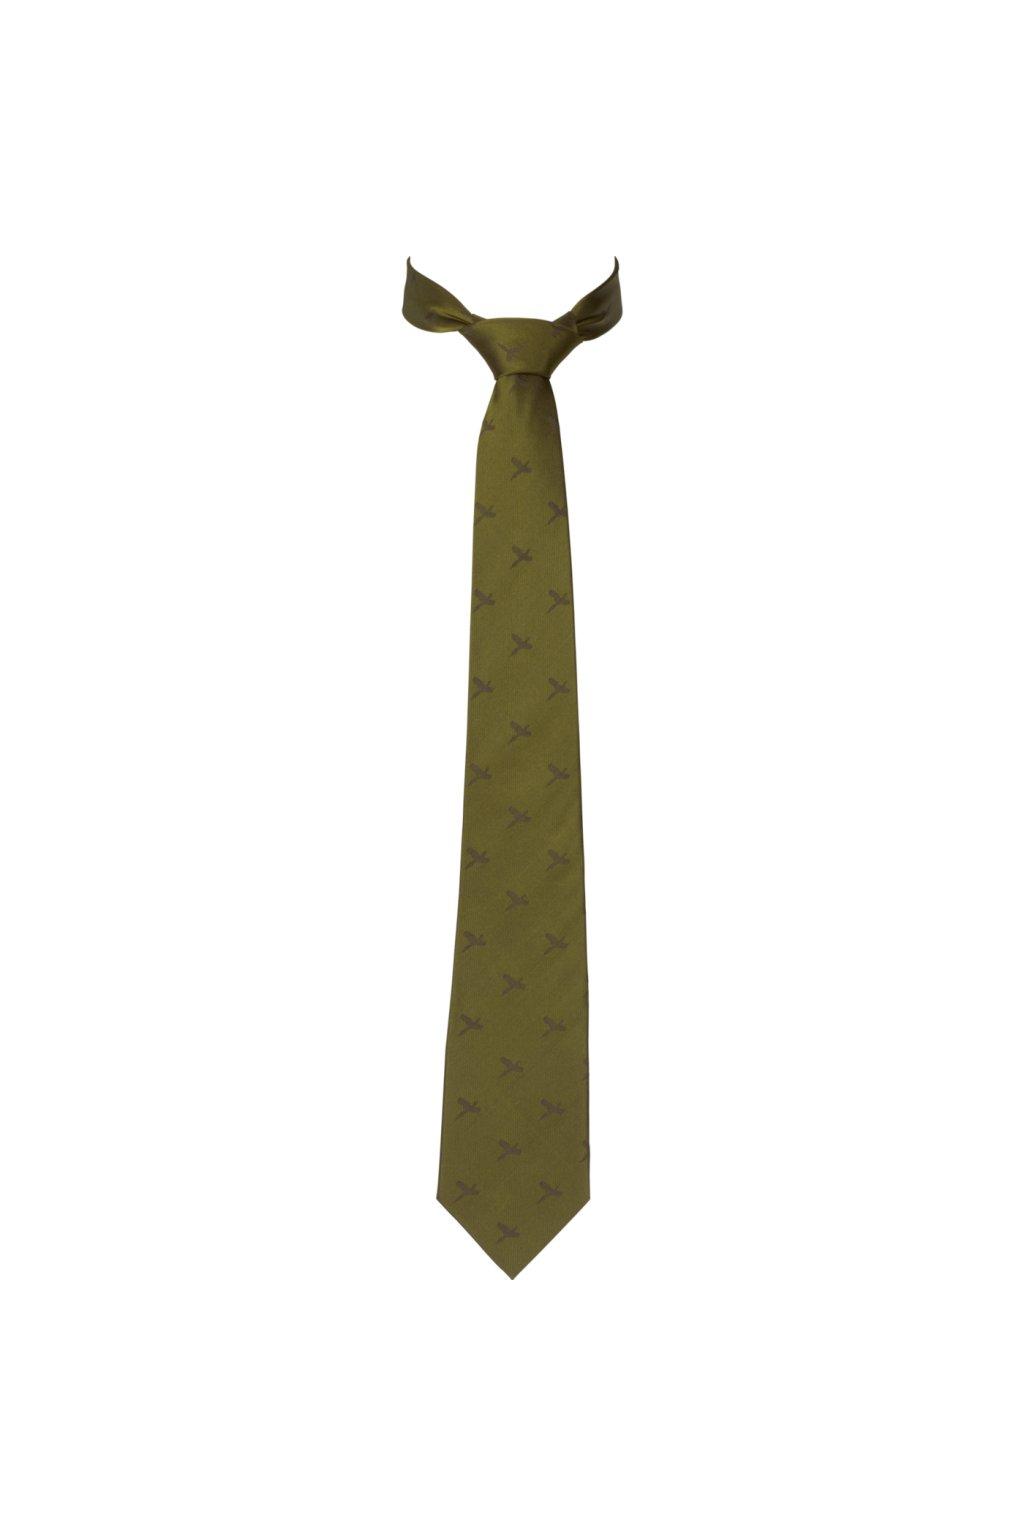 Harkila - Retrieve Pheasant kravata Olive